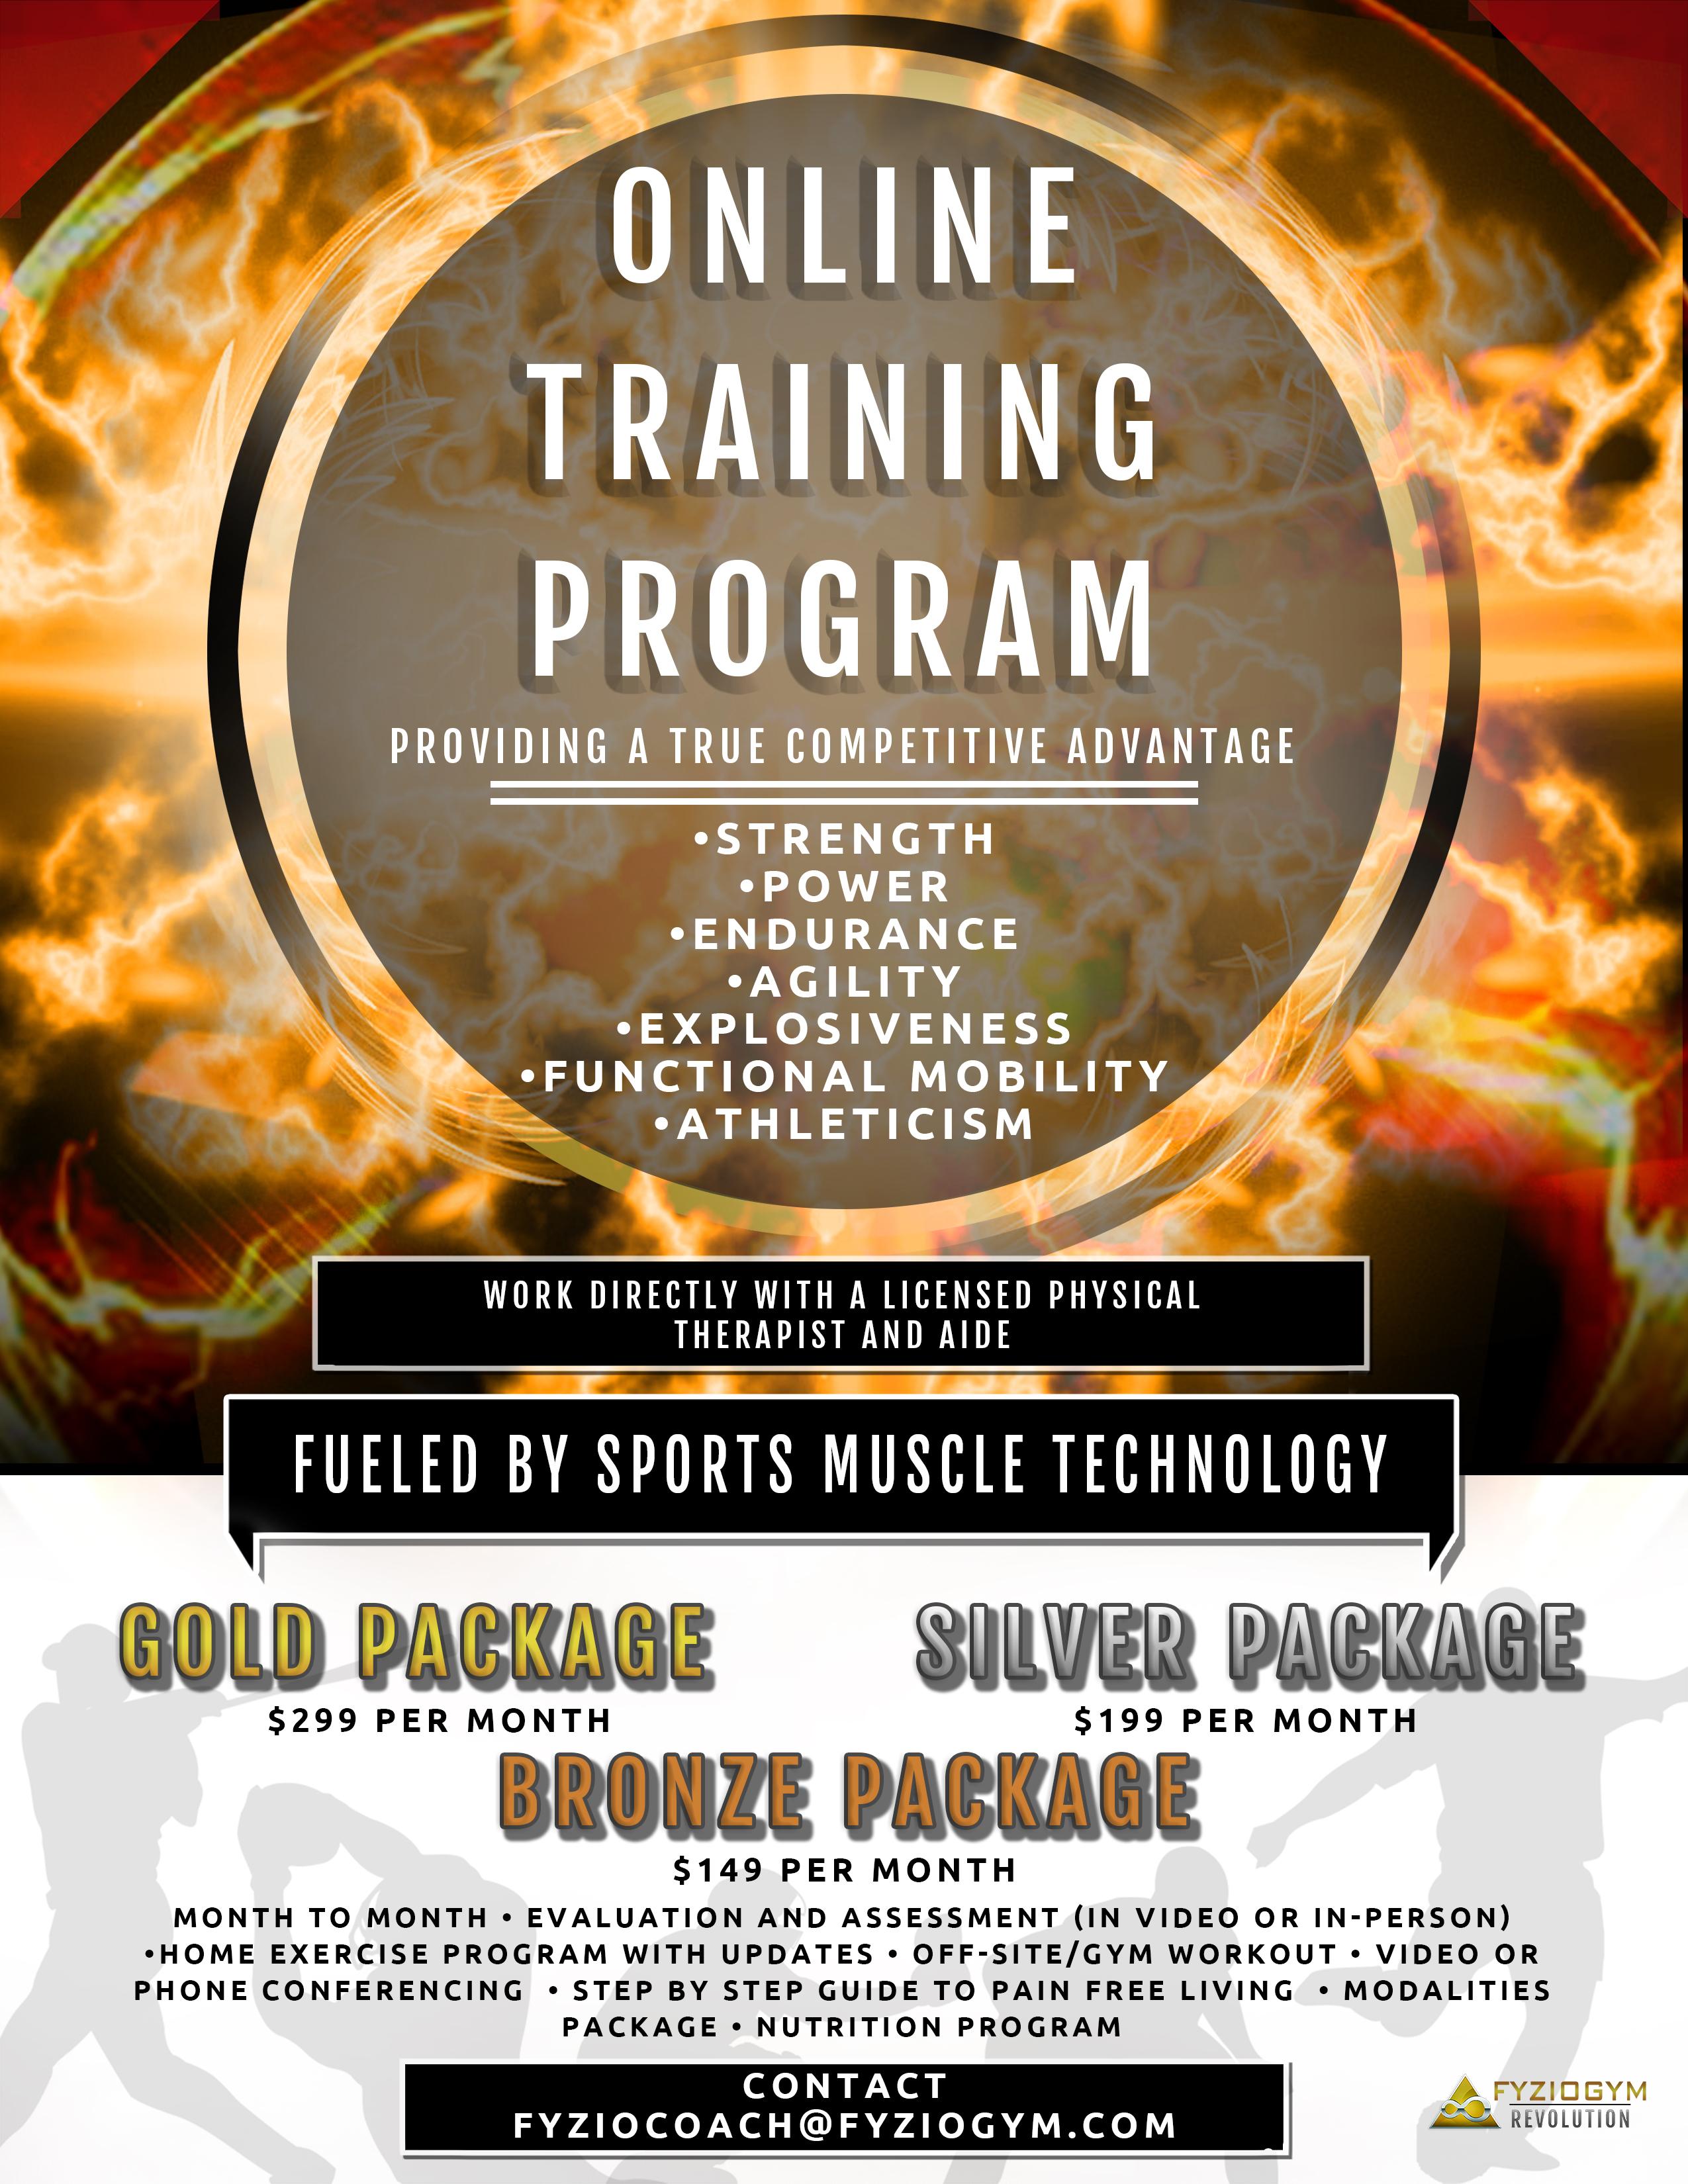 Online Training 00013